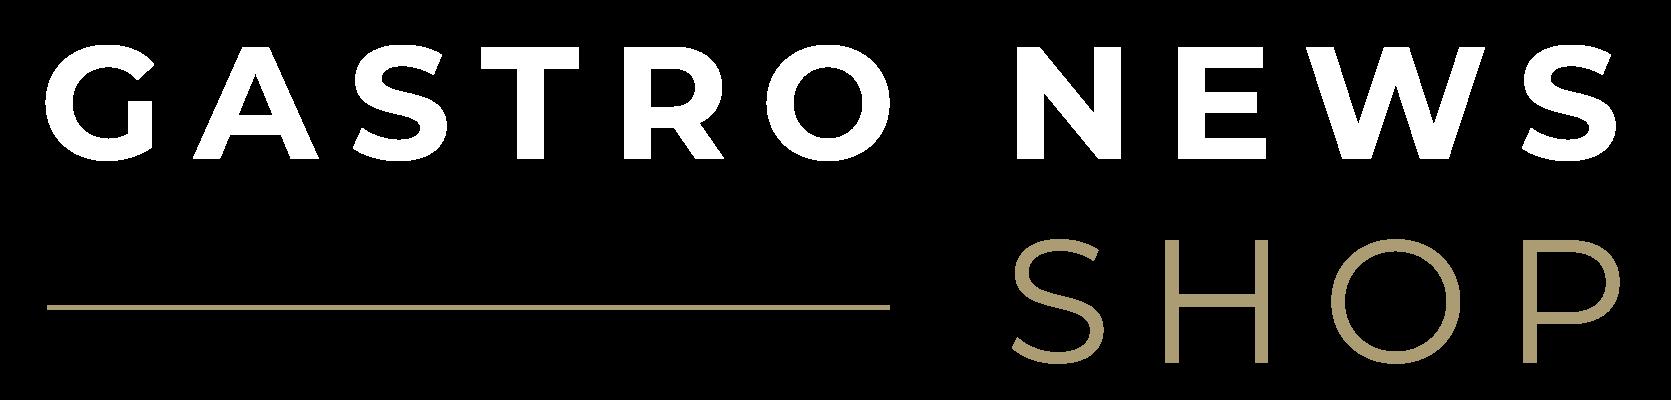 Gastro News Shop Logo